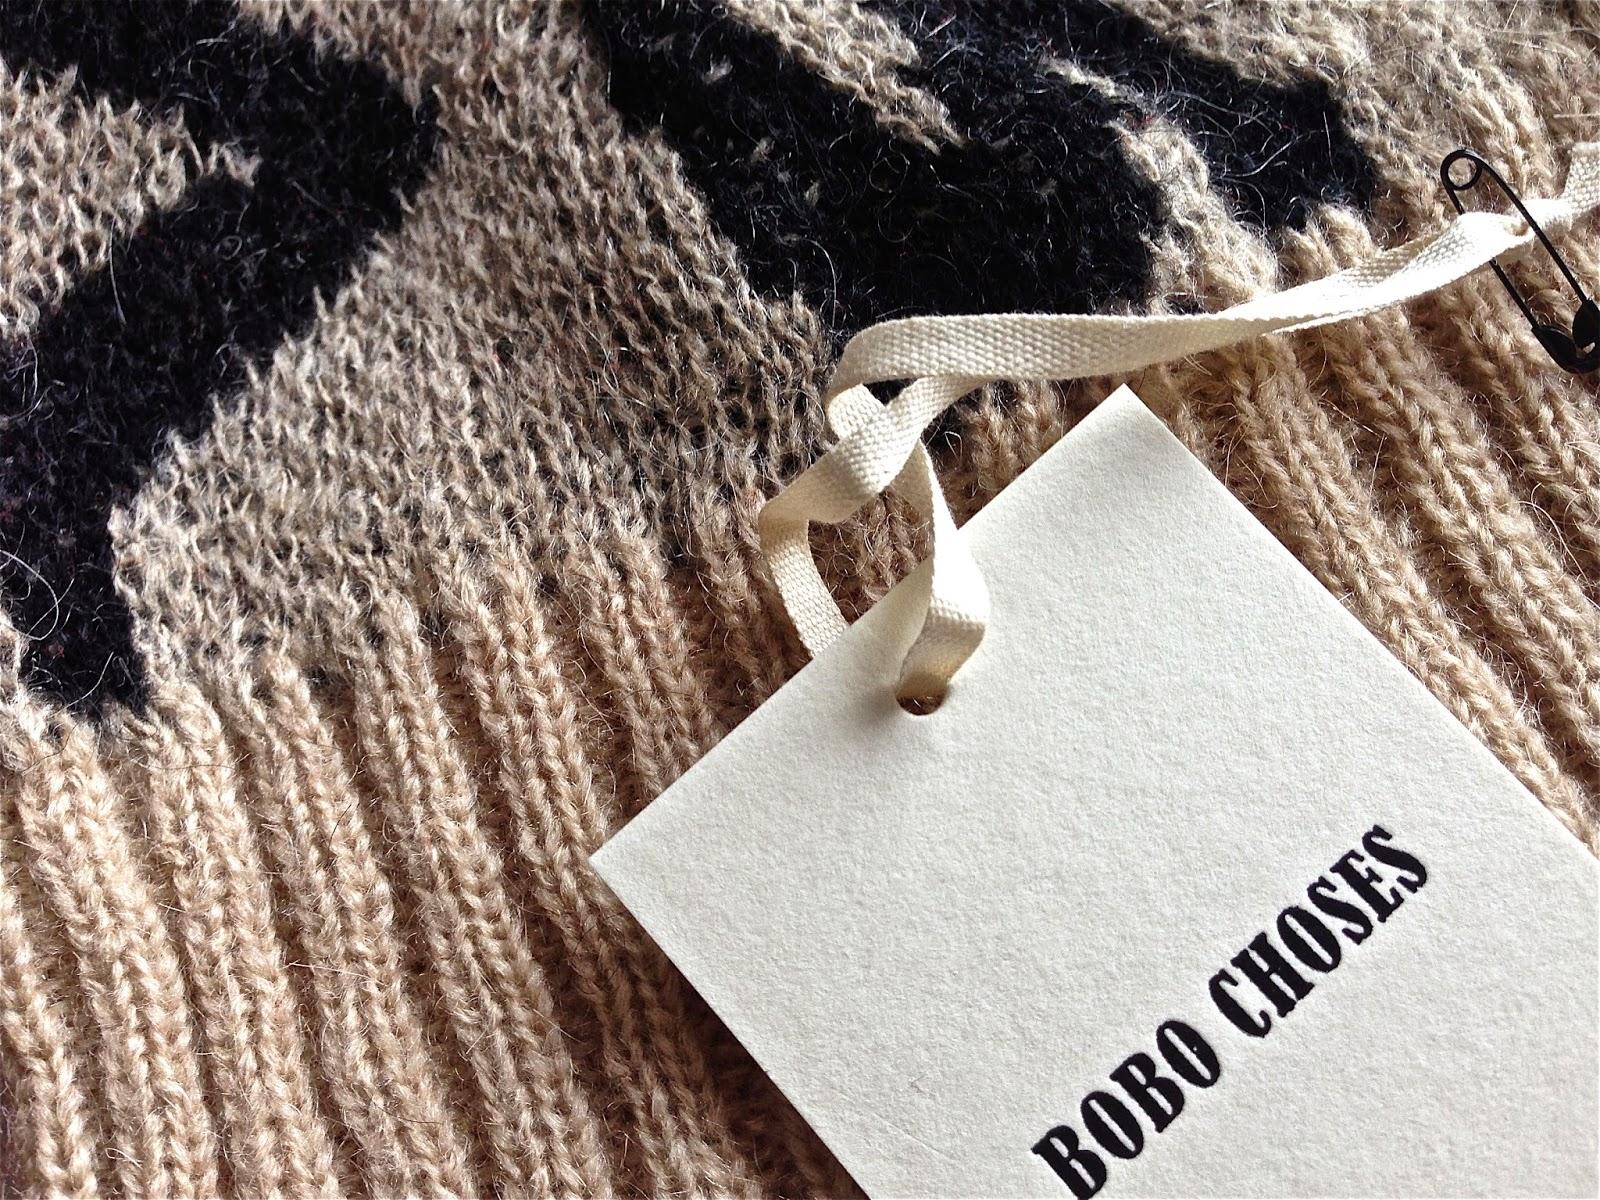 Bobo Choses, knit hat, mohair, 6-7 years, 6-7 år, small sizing, liten storlek, ylle mössa, tofs mössa